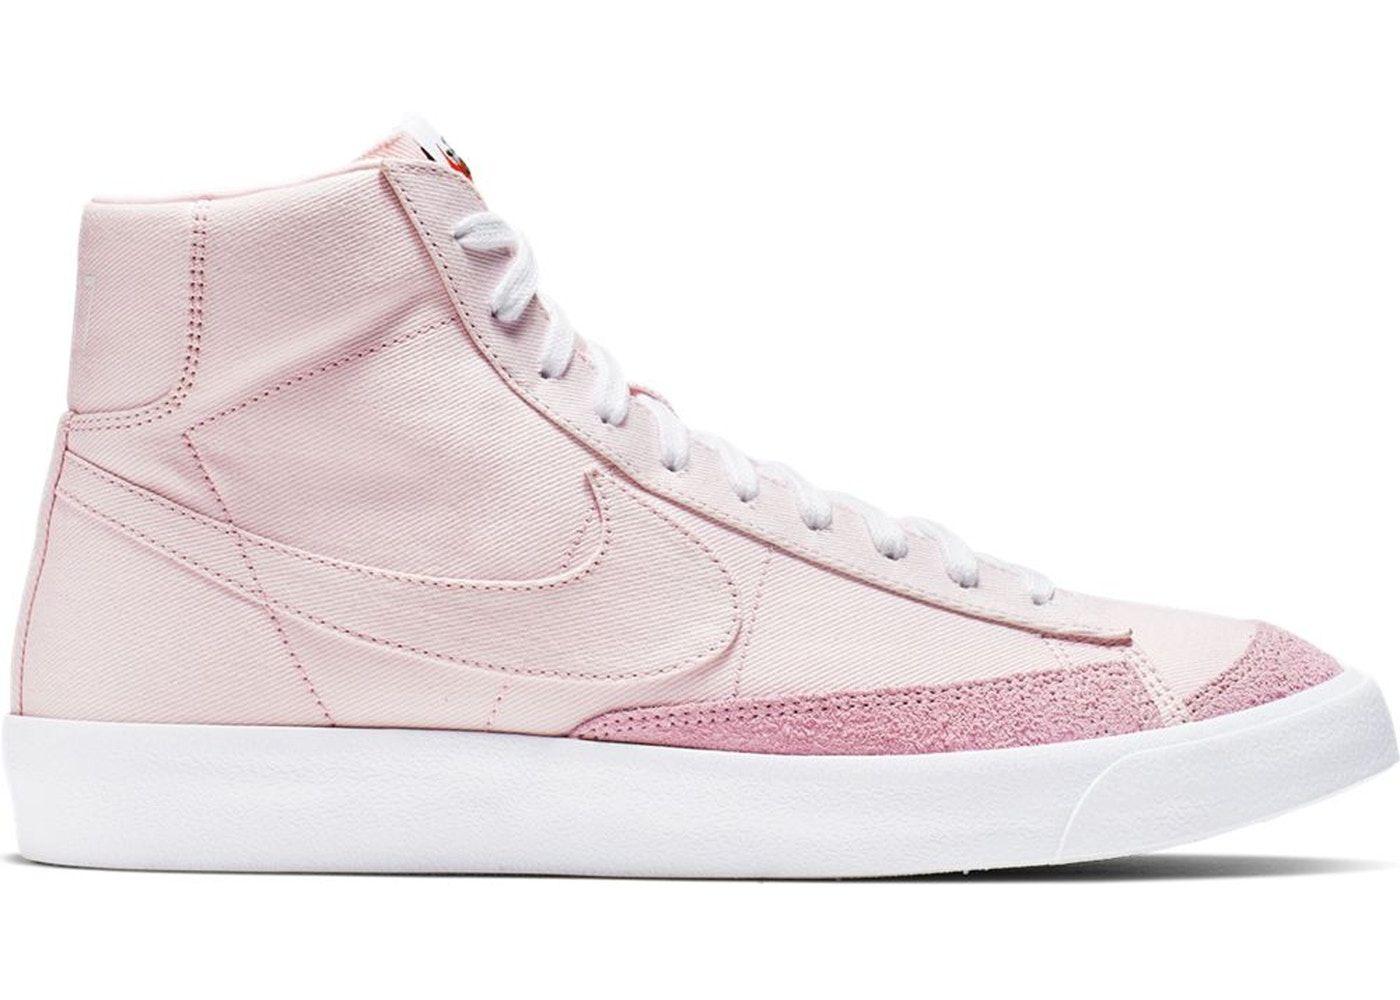 Nike Blazer Mid 77 Vintage Pink Foam in 2021 | Pink nike shoes ...